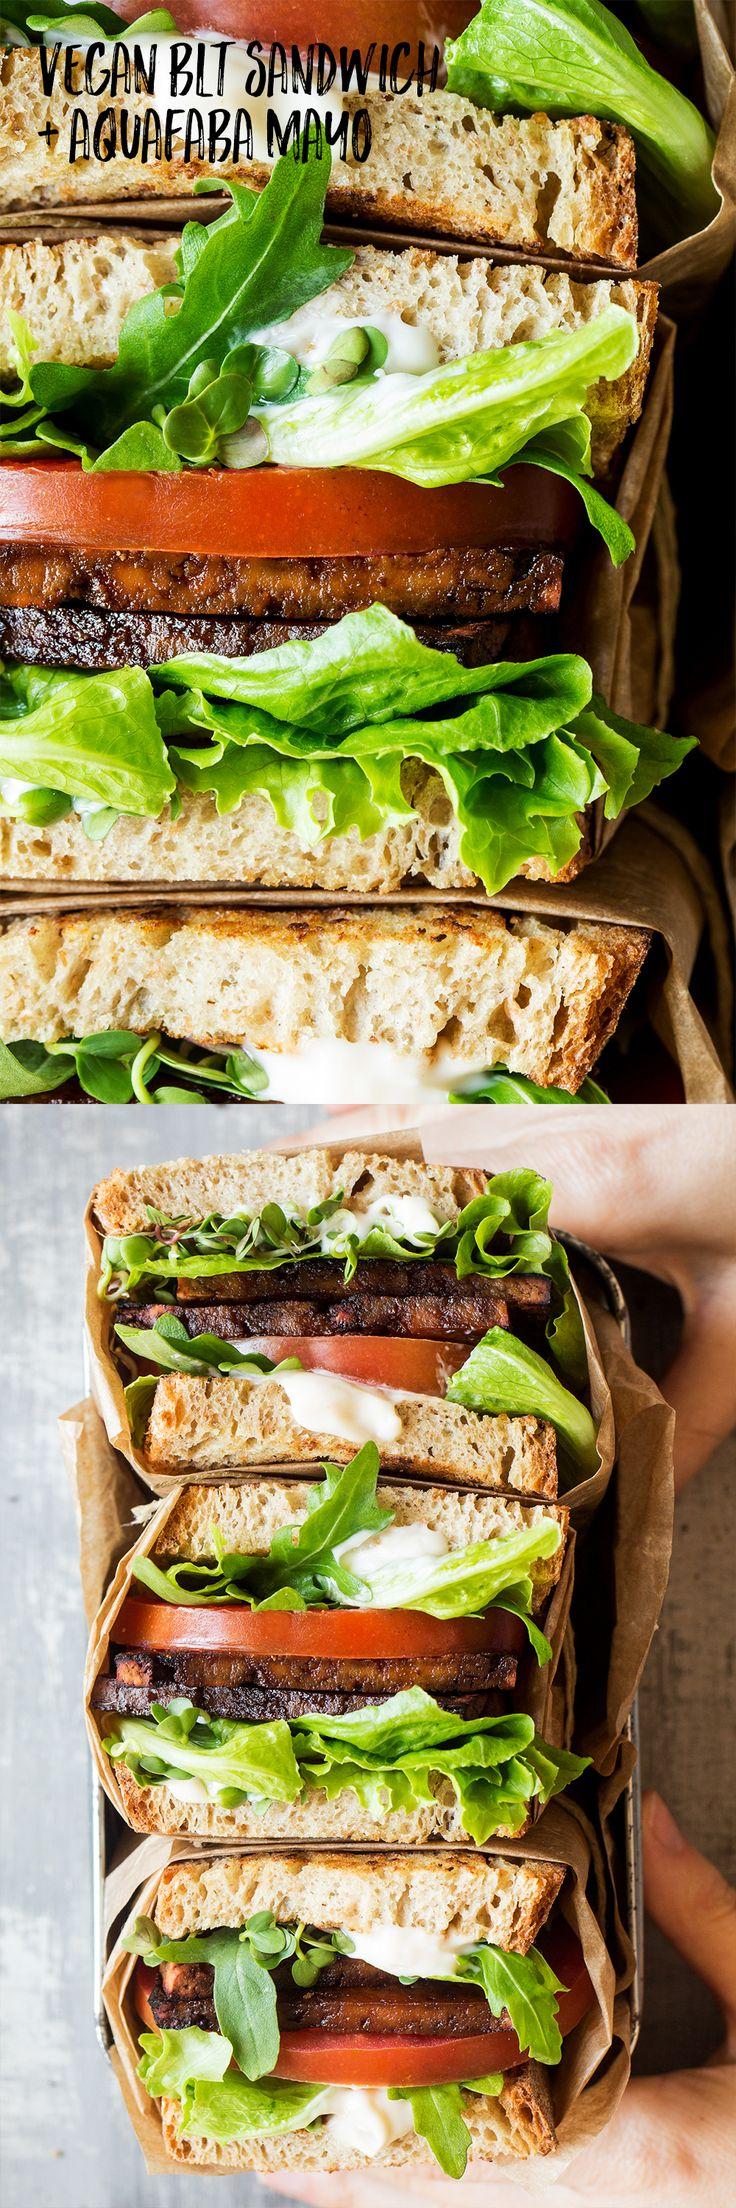 Vegan BLT sandwich with aquafaba mayo